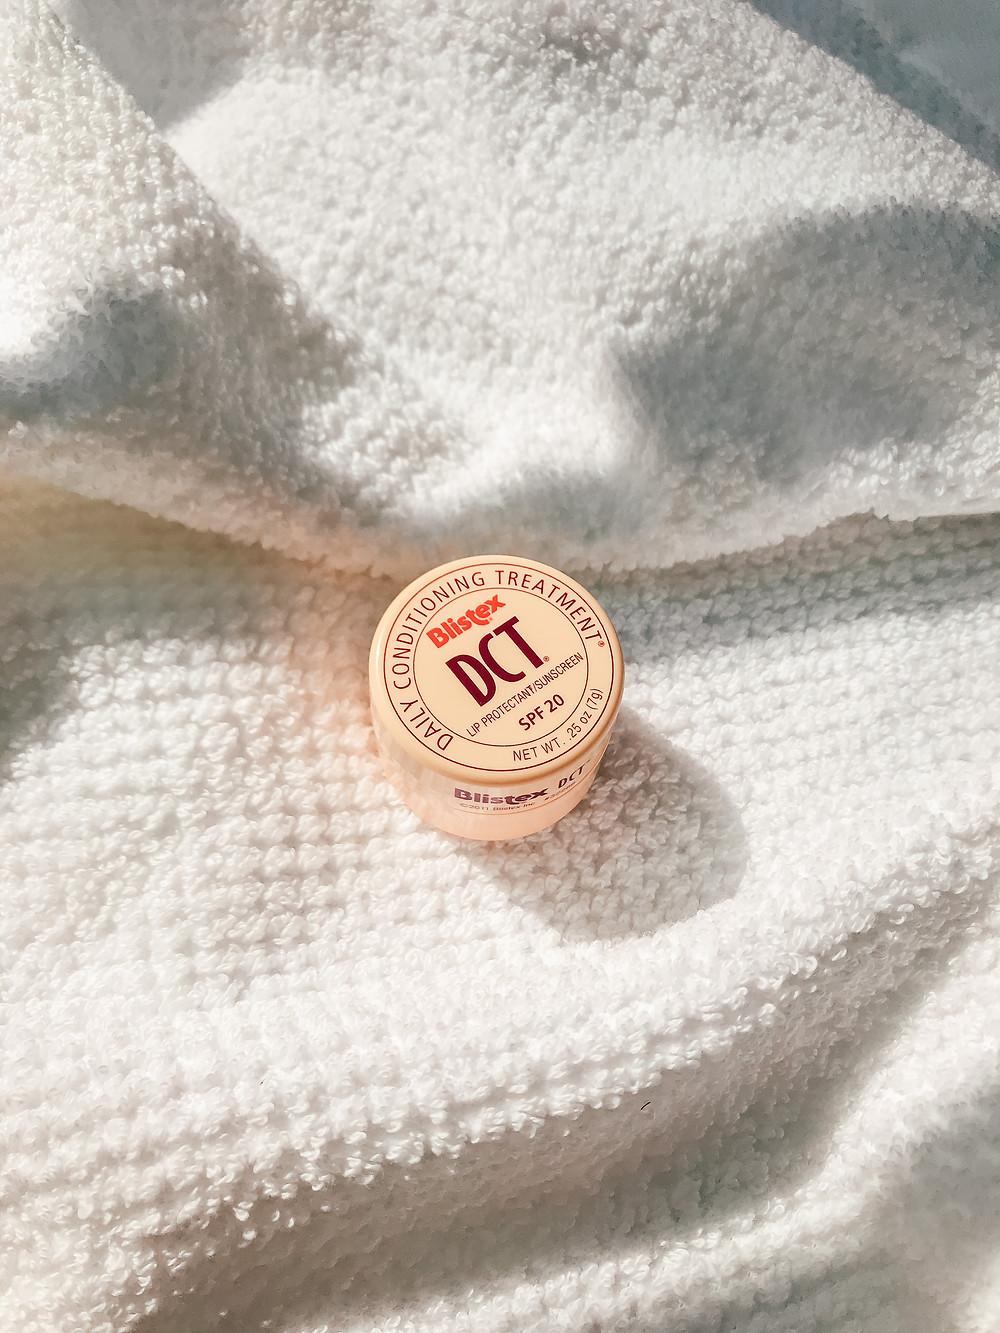 Blistex DCT Lip Conditioning Treatment l November Favorites 2018 l Bath & Body Products l Beauty l A Style Alike